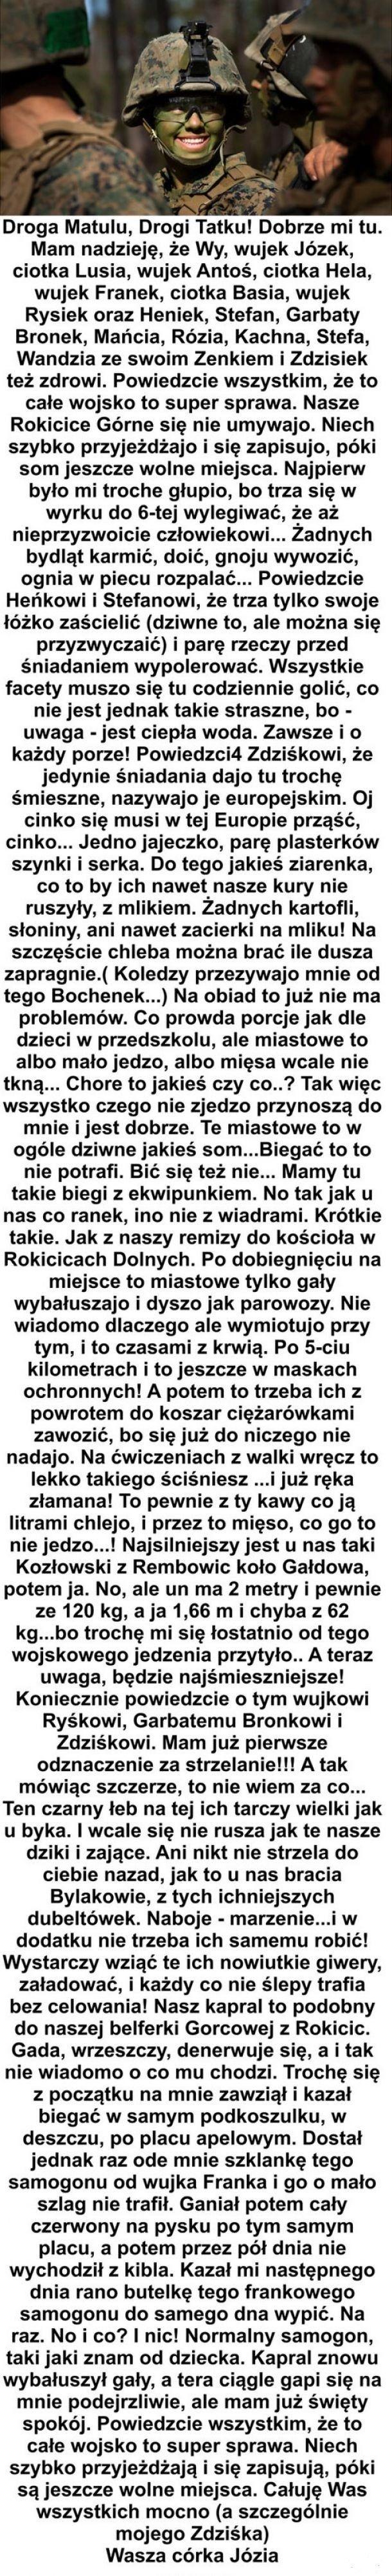 List z koszar